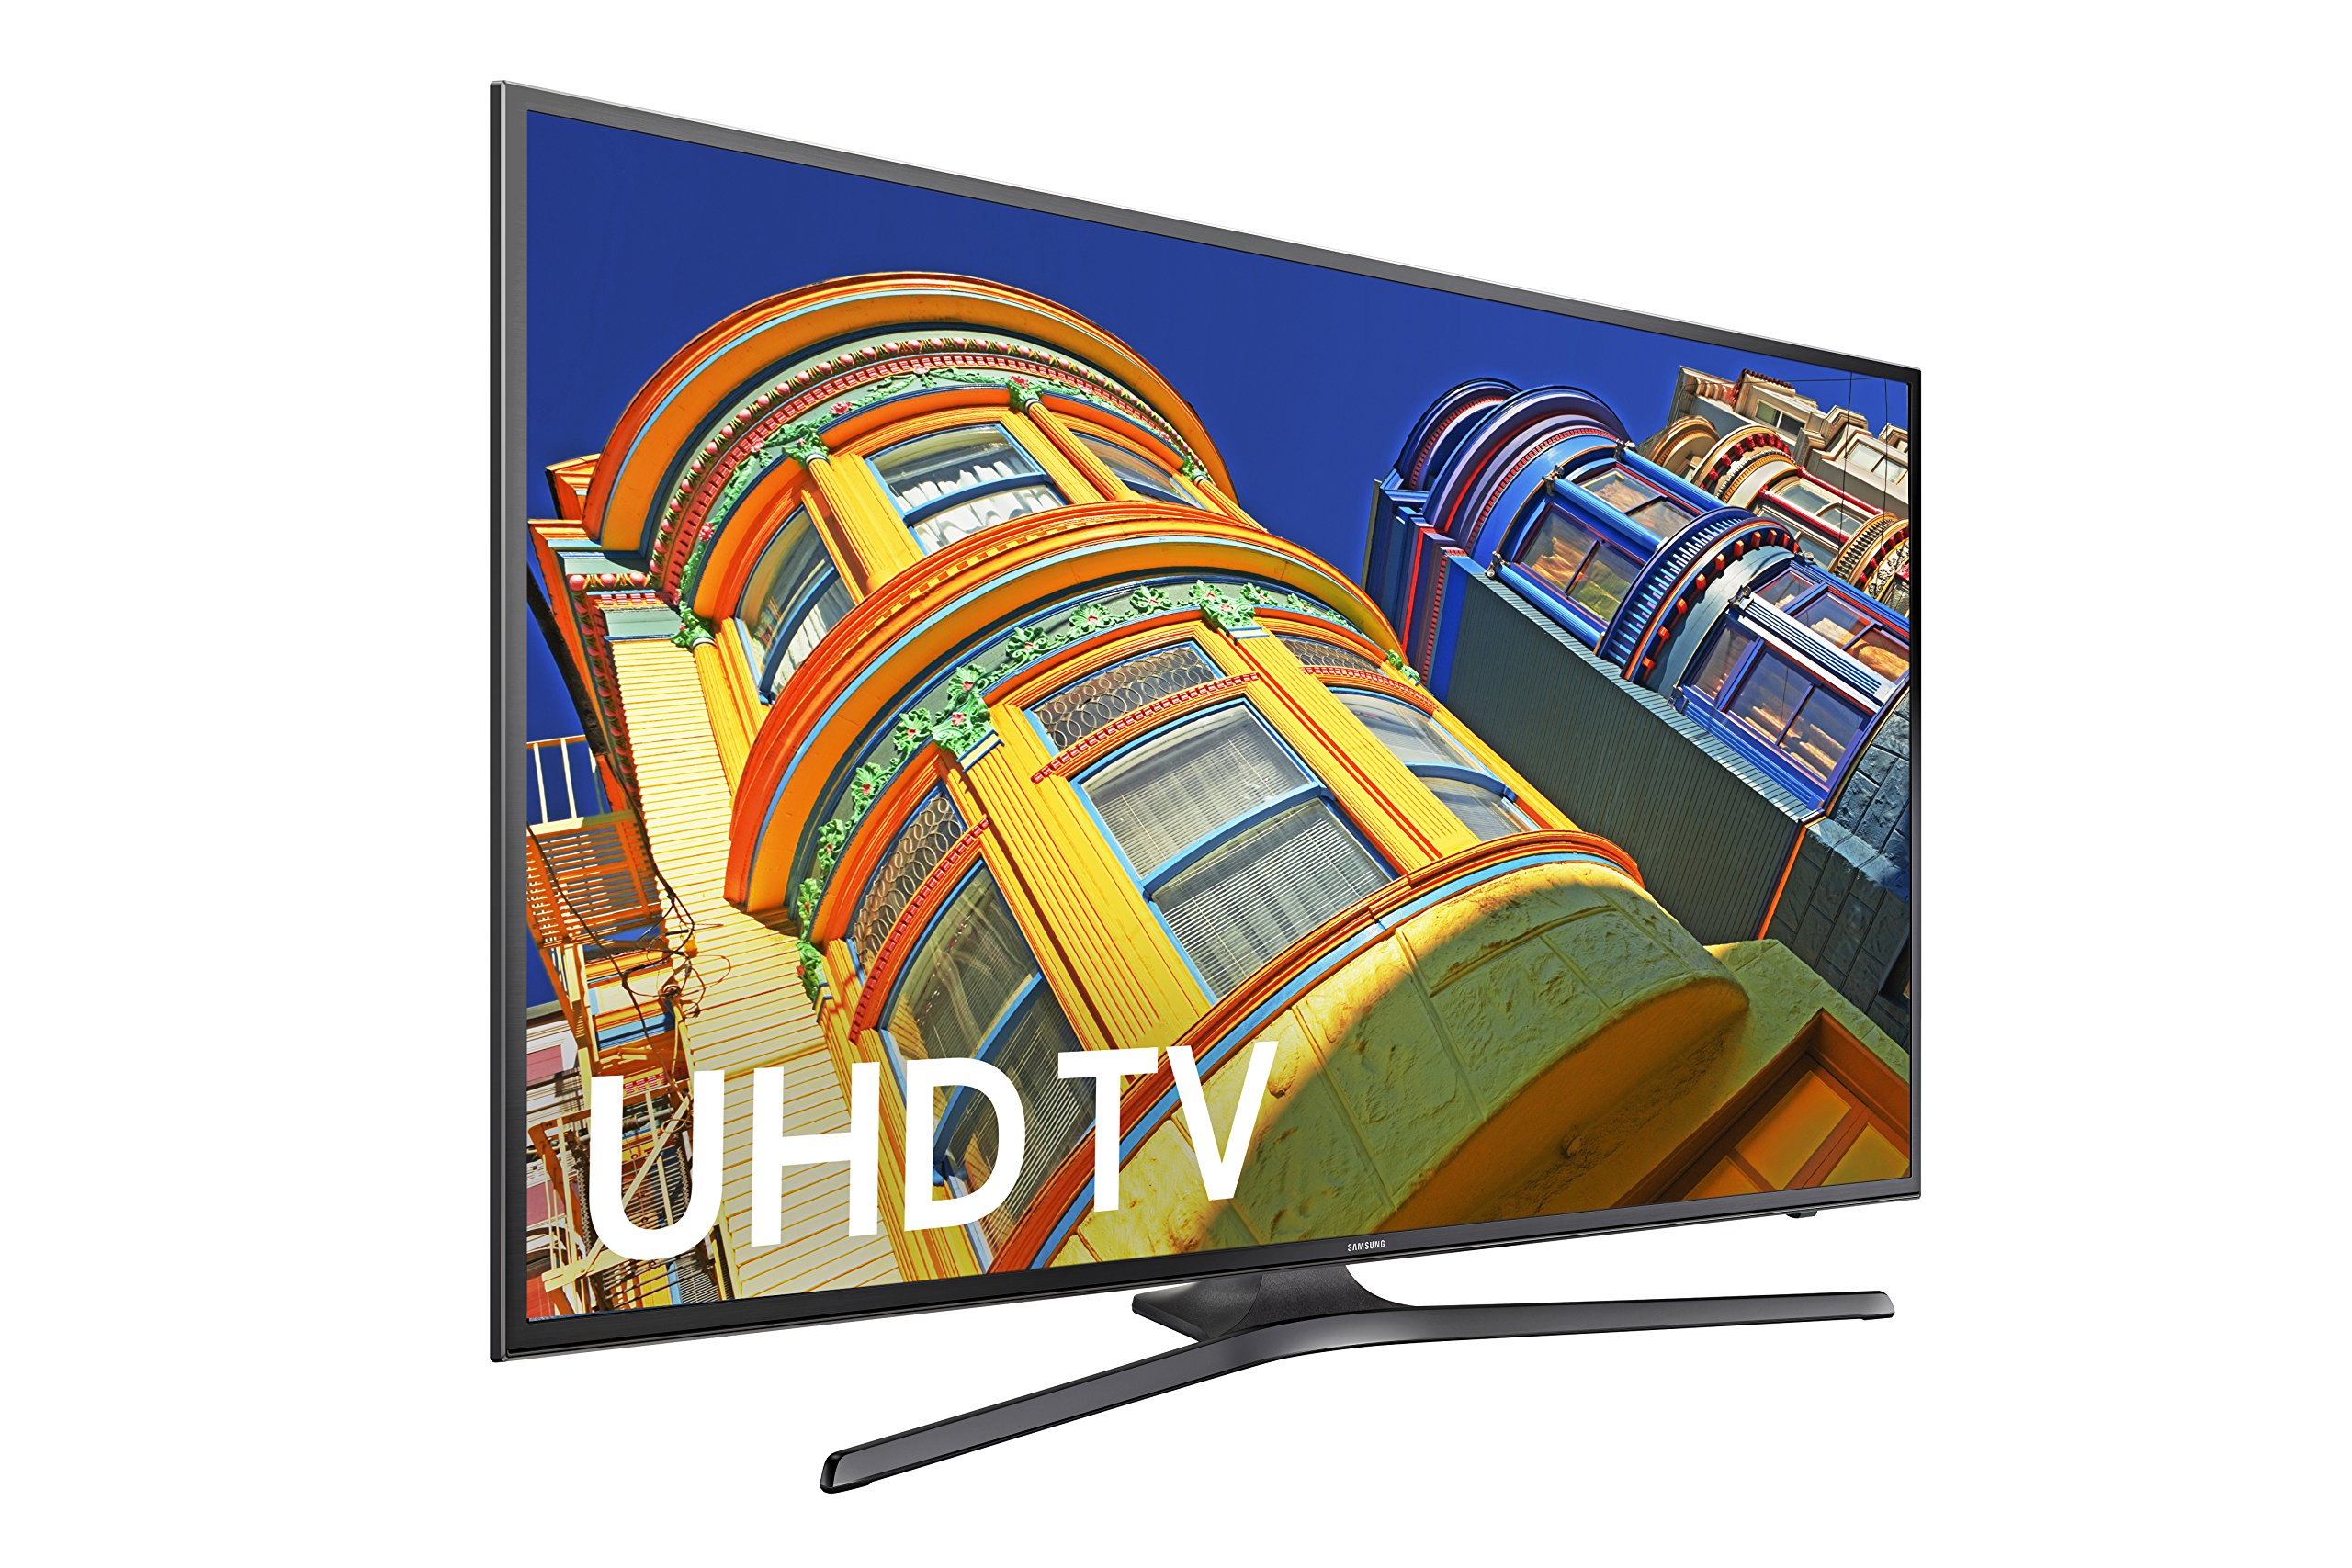 Samsung UN65KU6300 65-Inch 4K Ultra HD Smart LED TV (2016 Model)